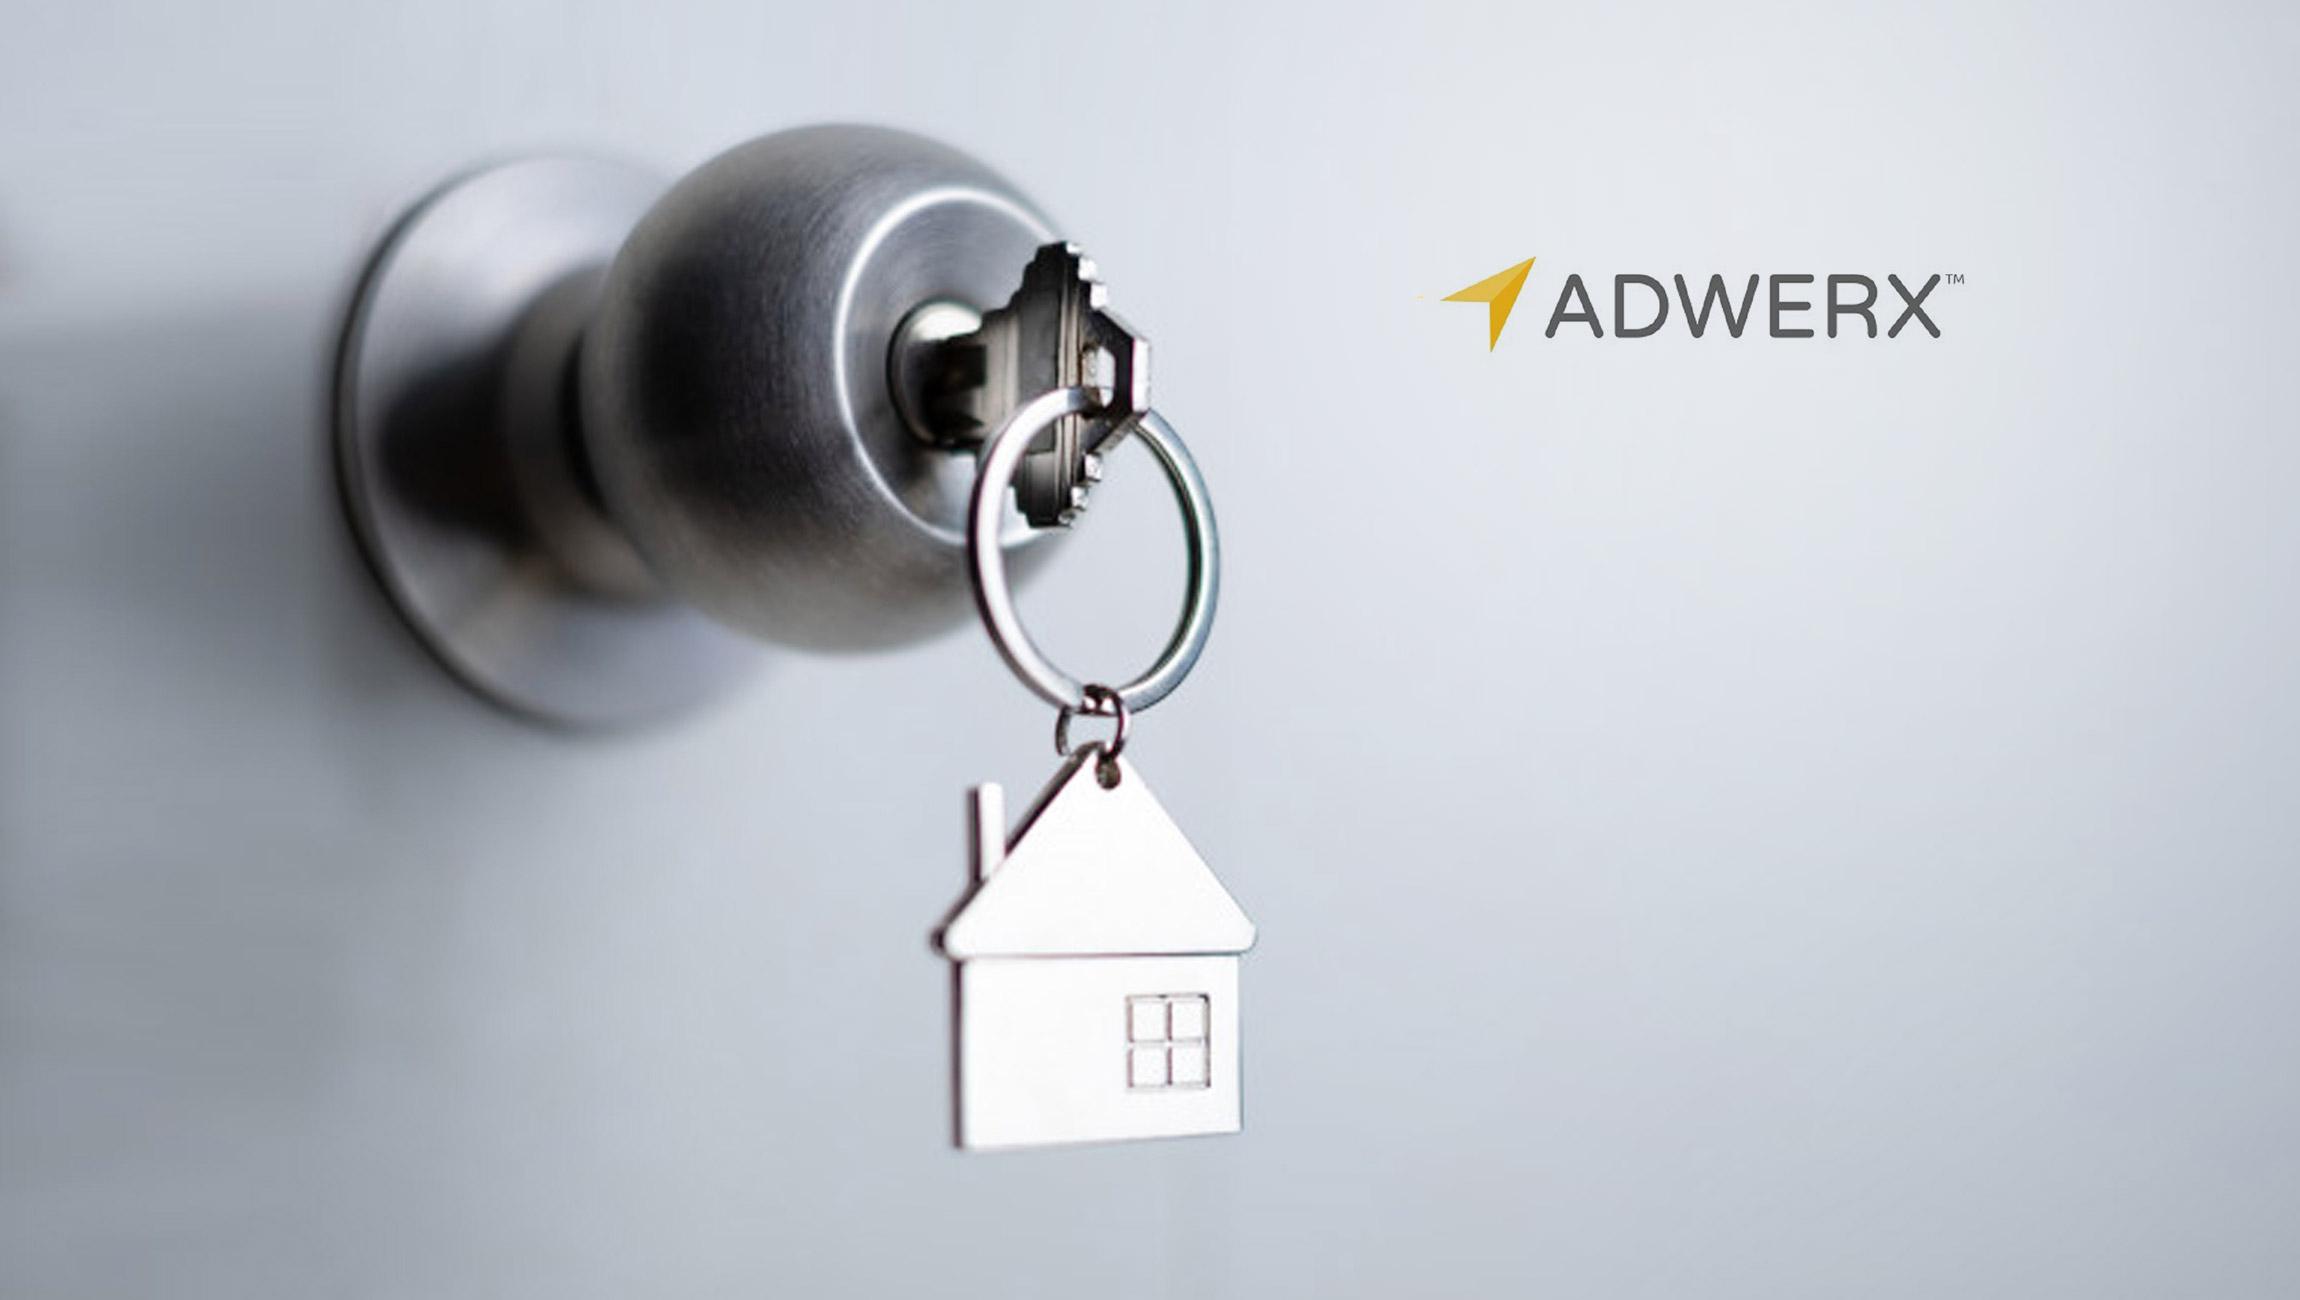 The Keyes Company Adopts New Adwerx Enterprise Automated Retargeting Product